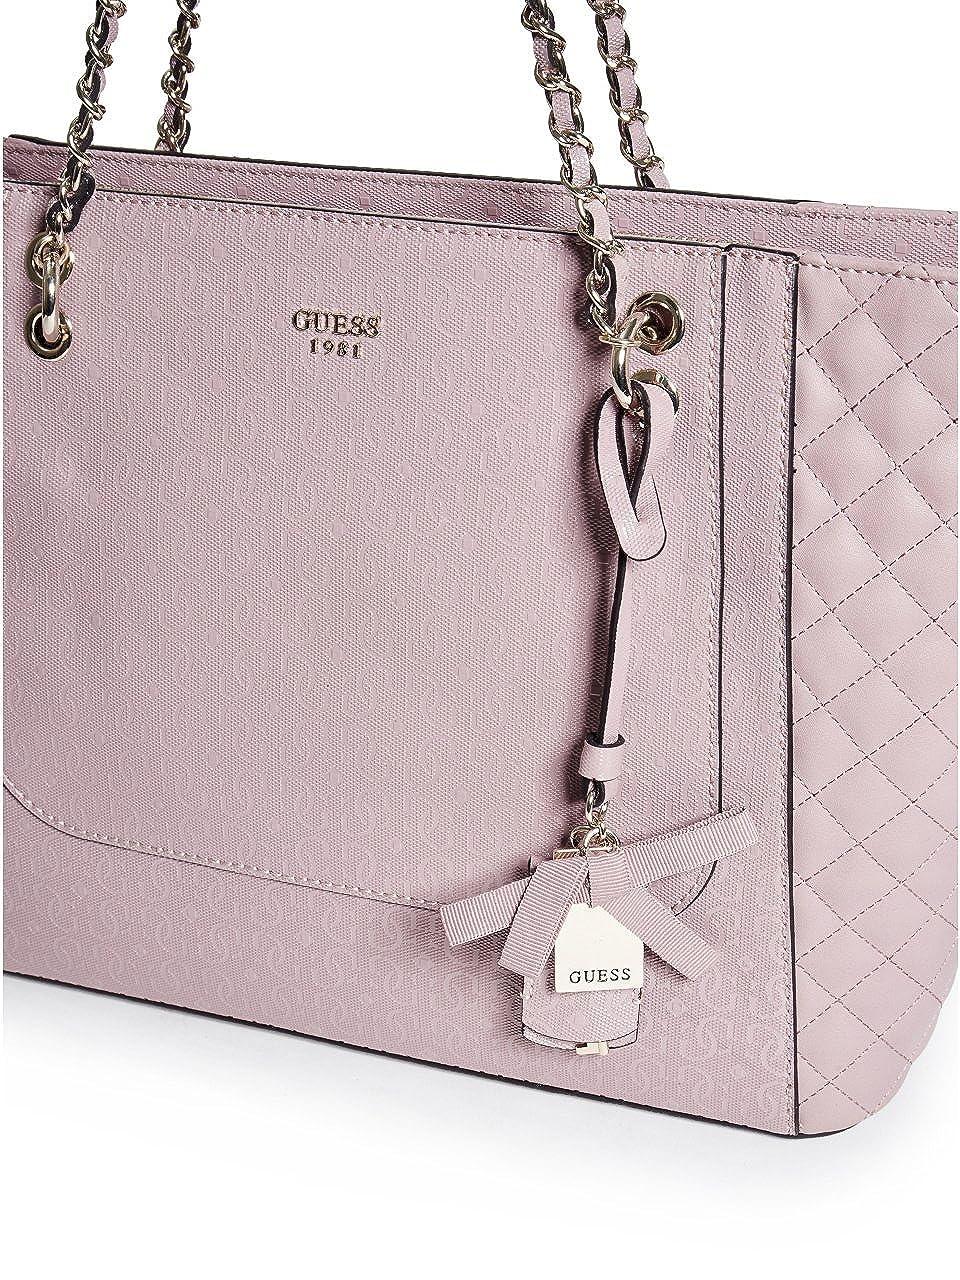 9fc87818e2ed Guess Women s Shoulder Bag One Size  Amazon.co.uk  Shoes   Bags